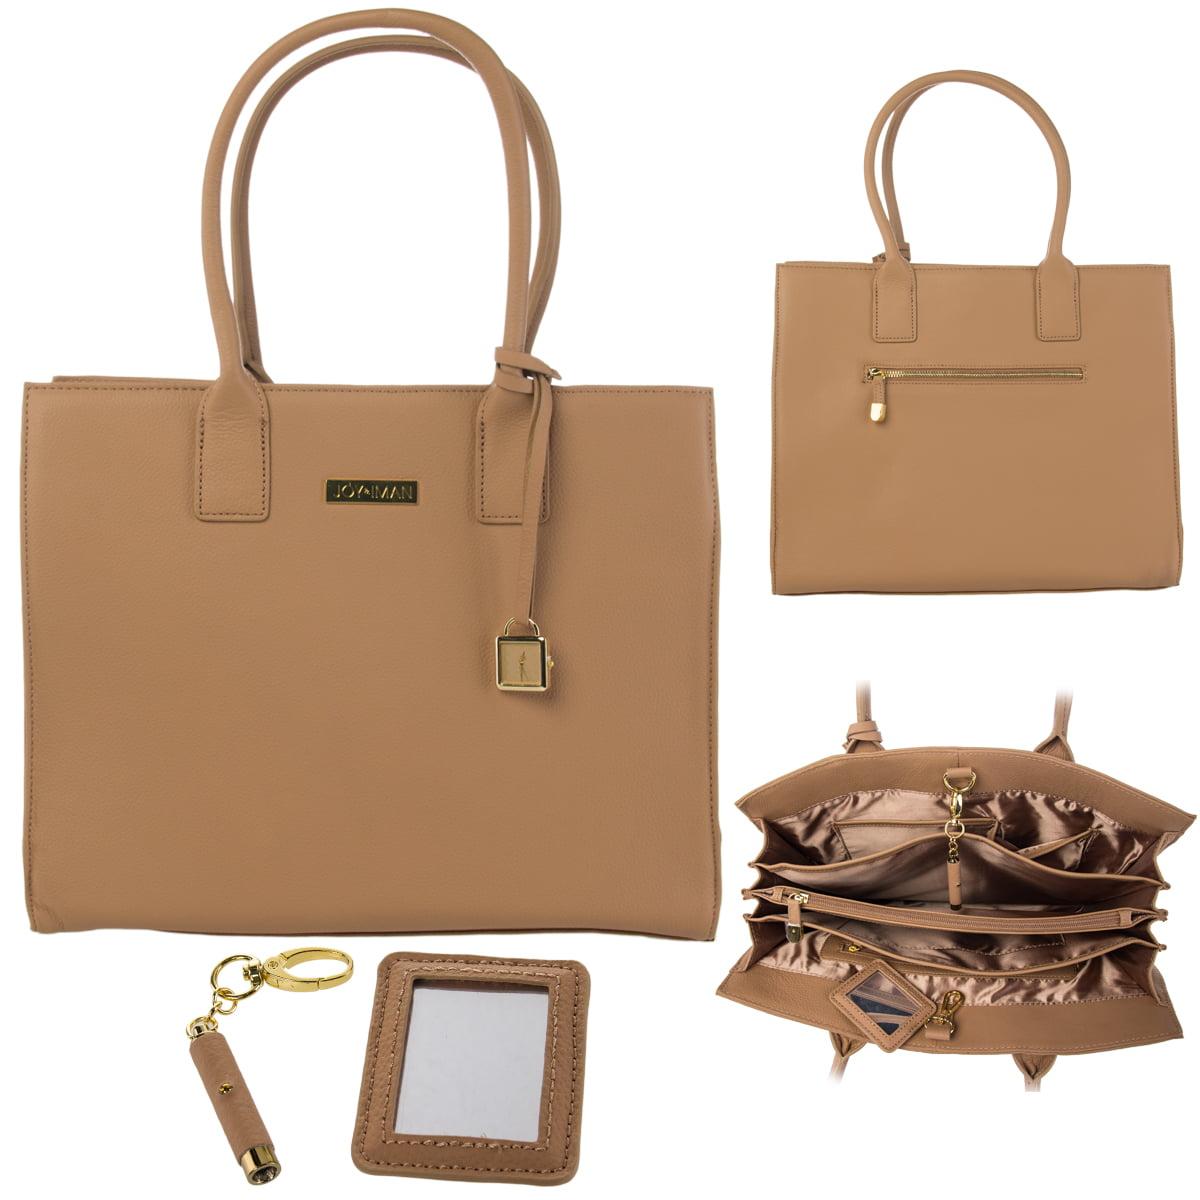 Joy Iman Genuine Leather Hollywood Glamour Handbag Satchel Large Tote Purse